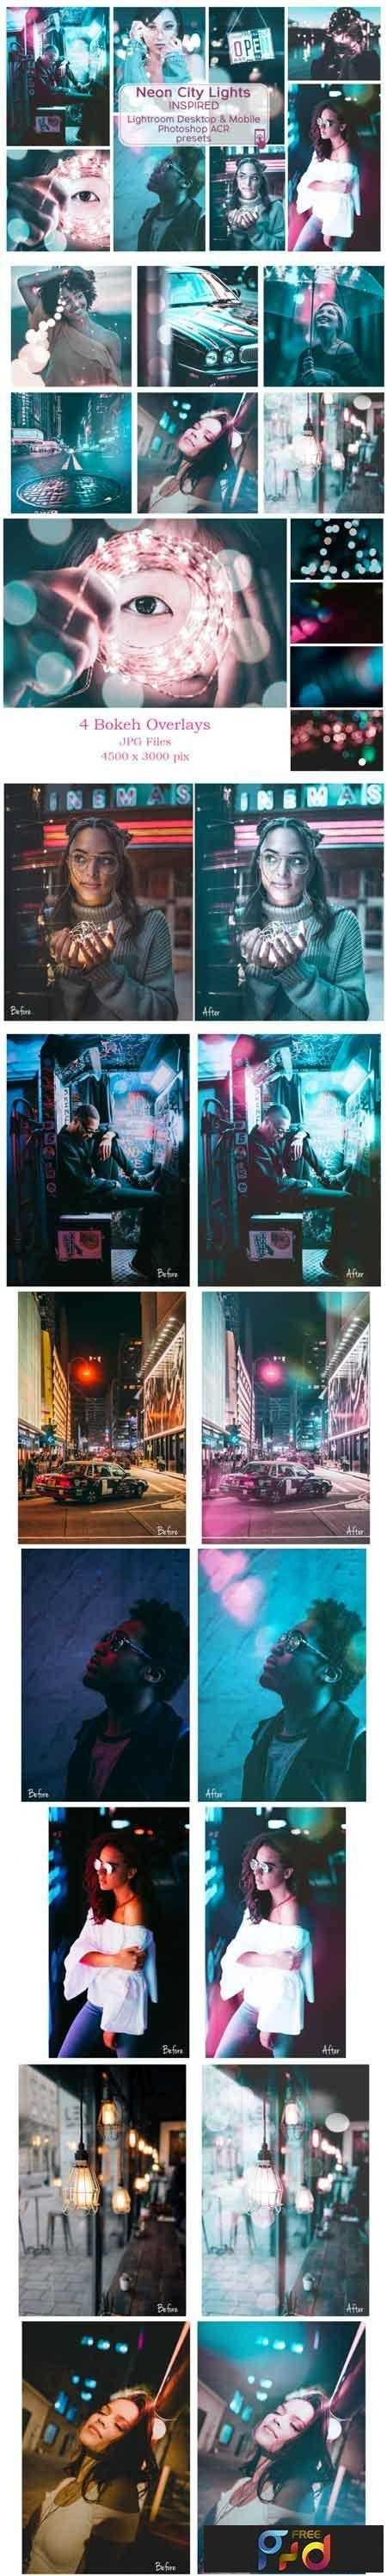 1808244 Lr & Ps Presets ACR Neon City Lights 3468626 - FreePSDvn